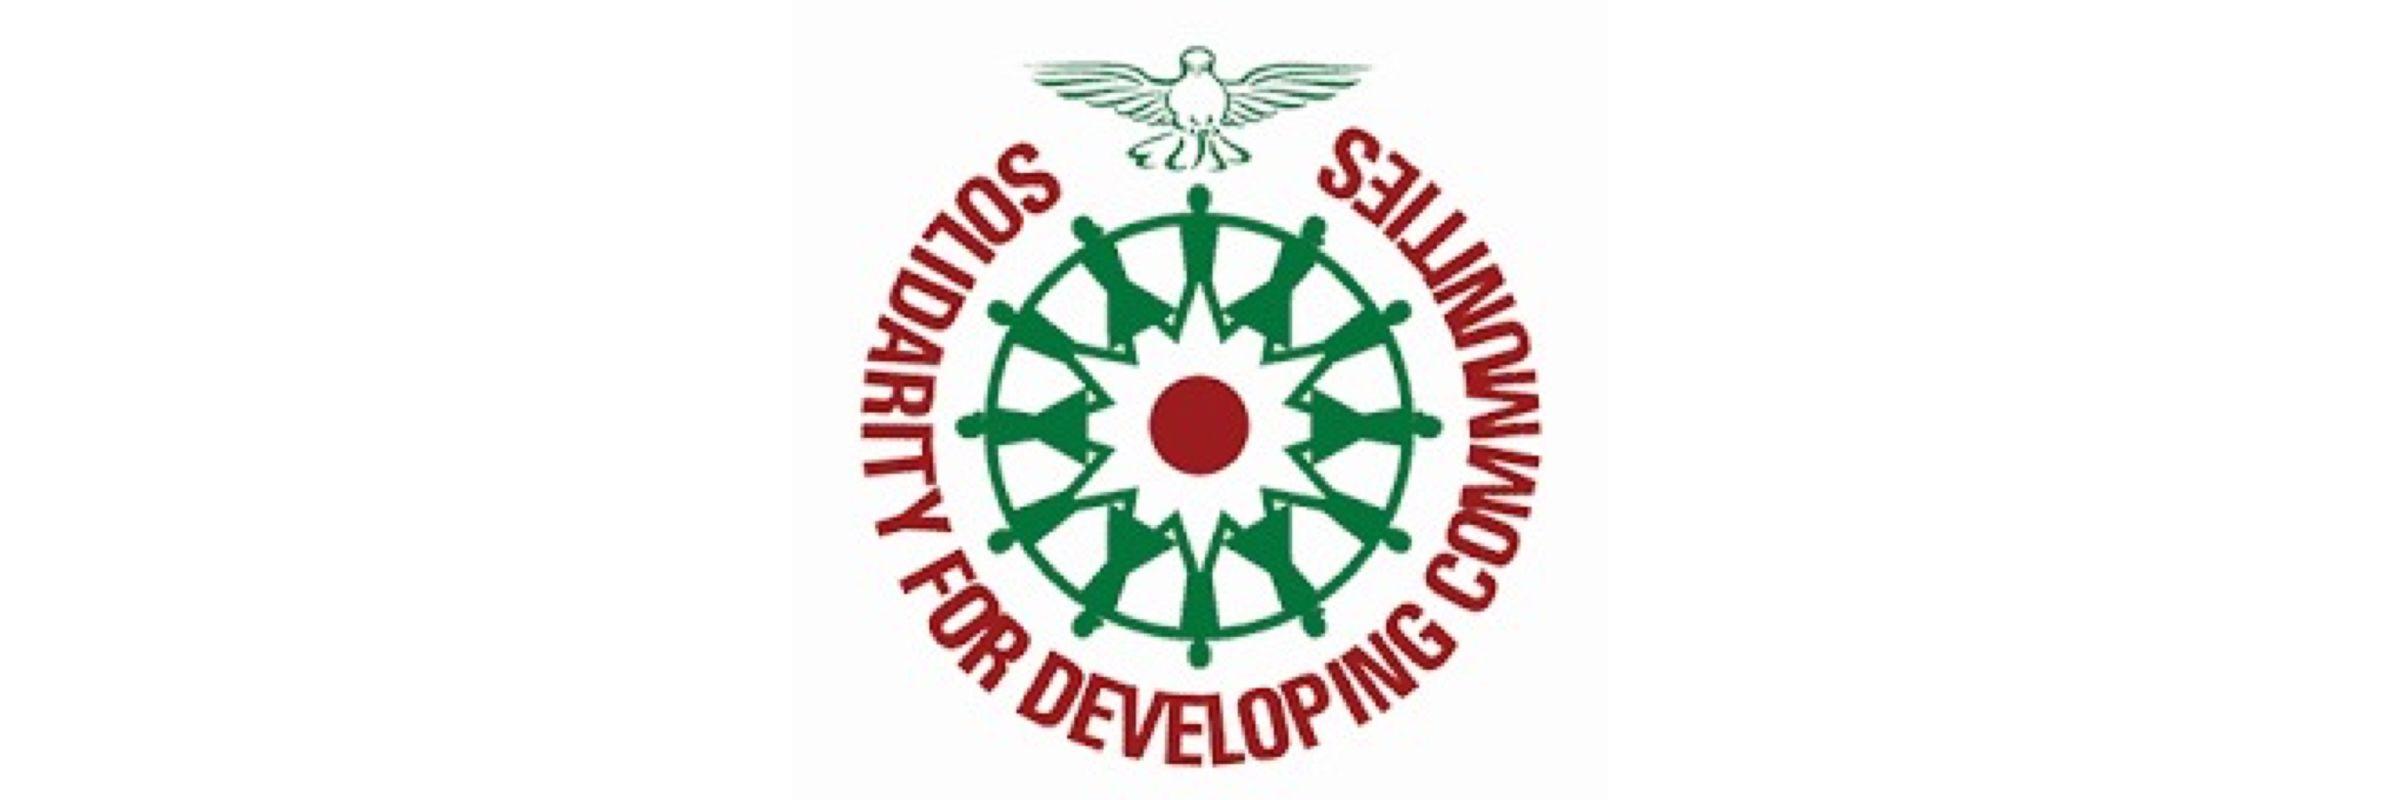 Solidarity For Developing Communities